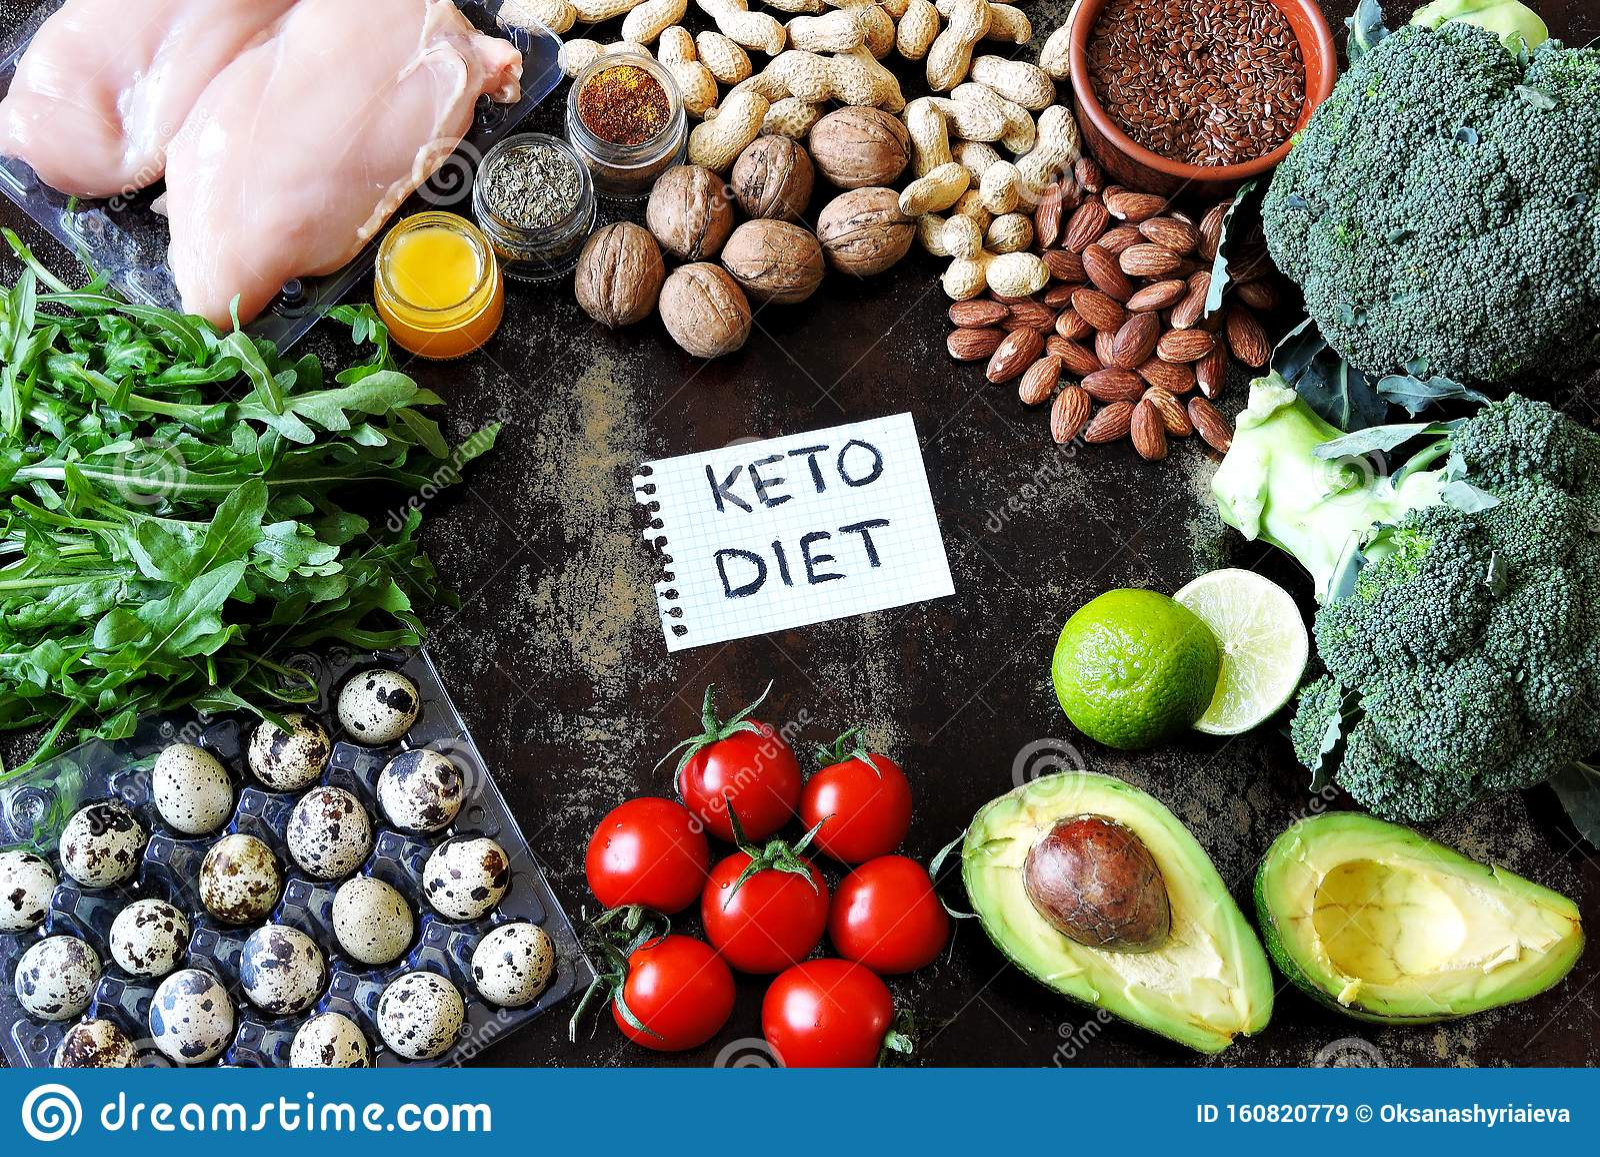 protein in quail eggs ketogenic diet